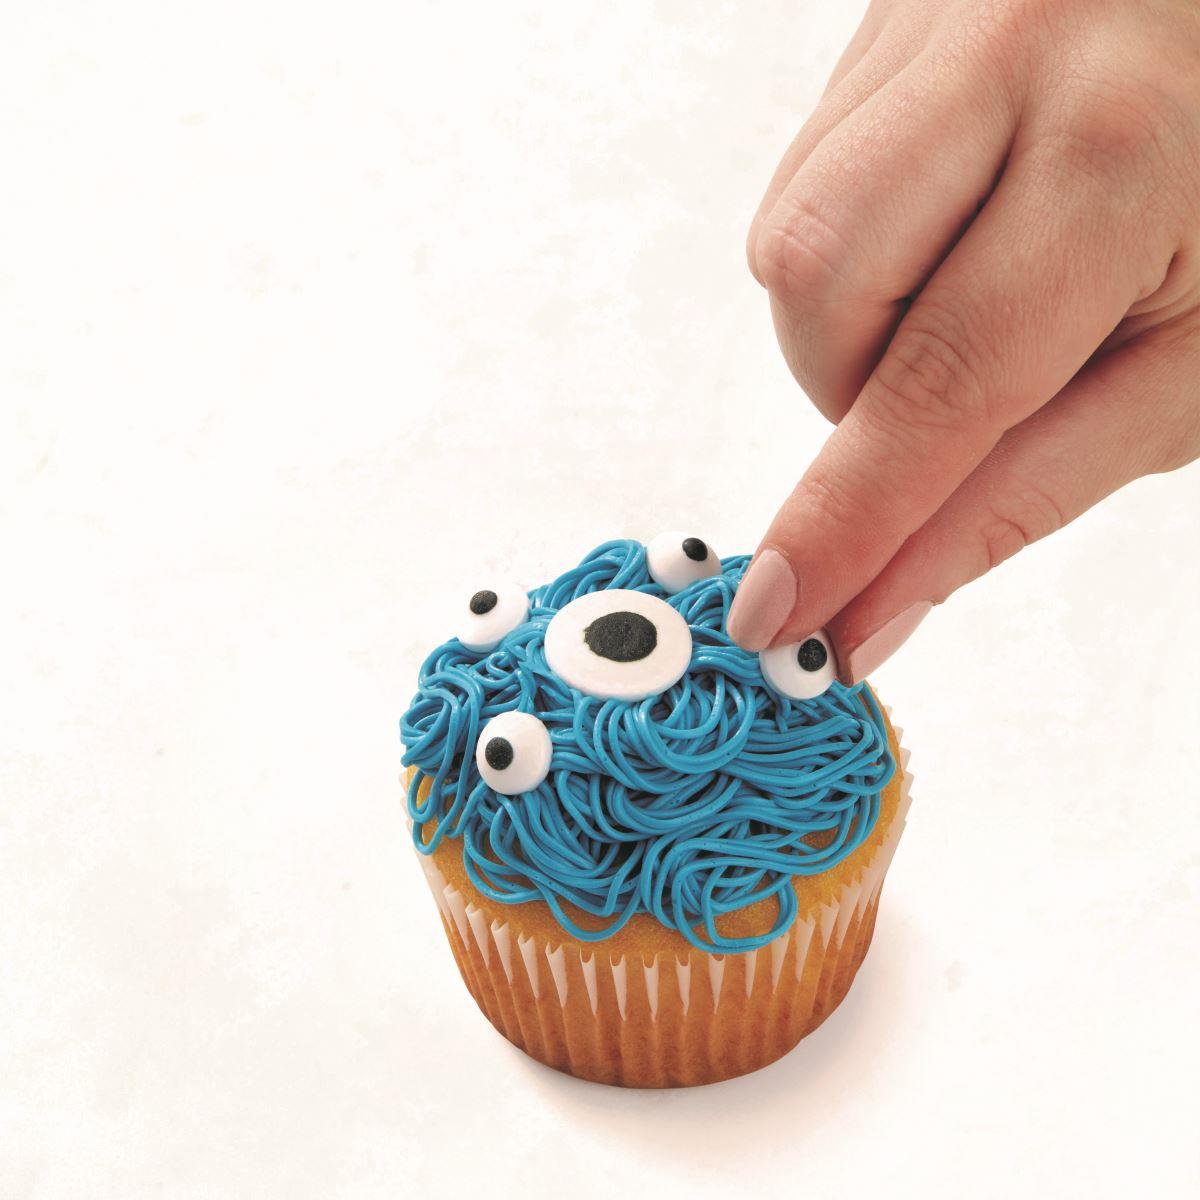 BLUE MULTI-EYED CUPCAKE step 2